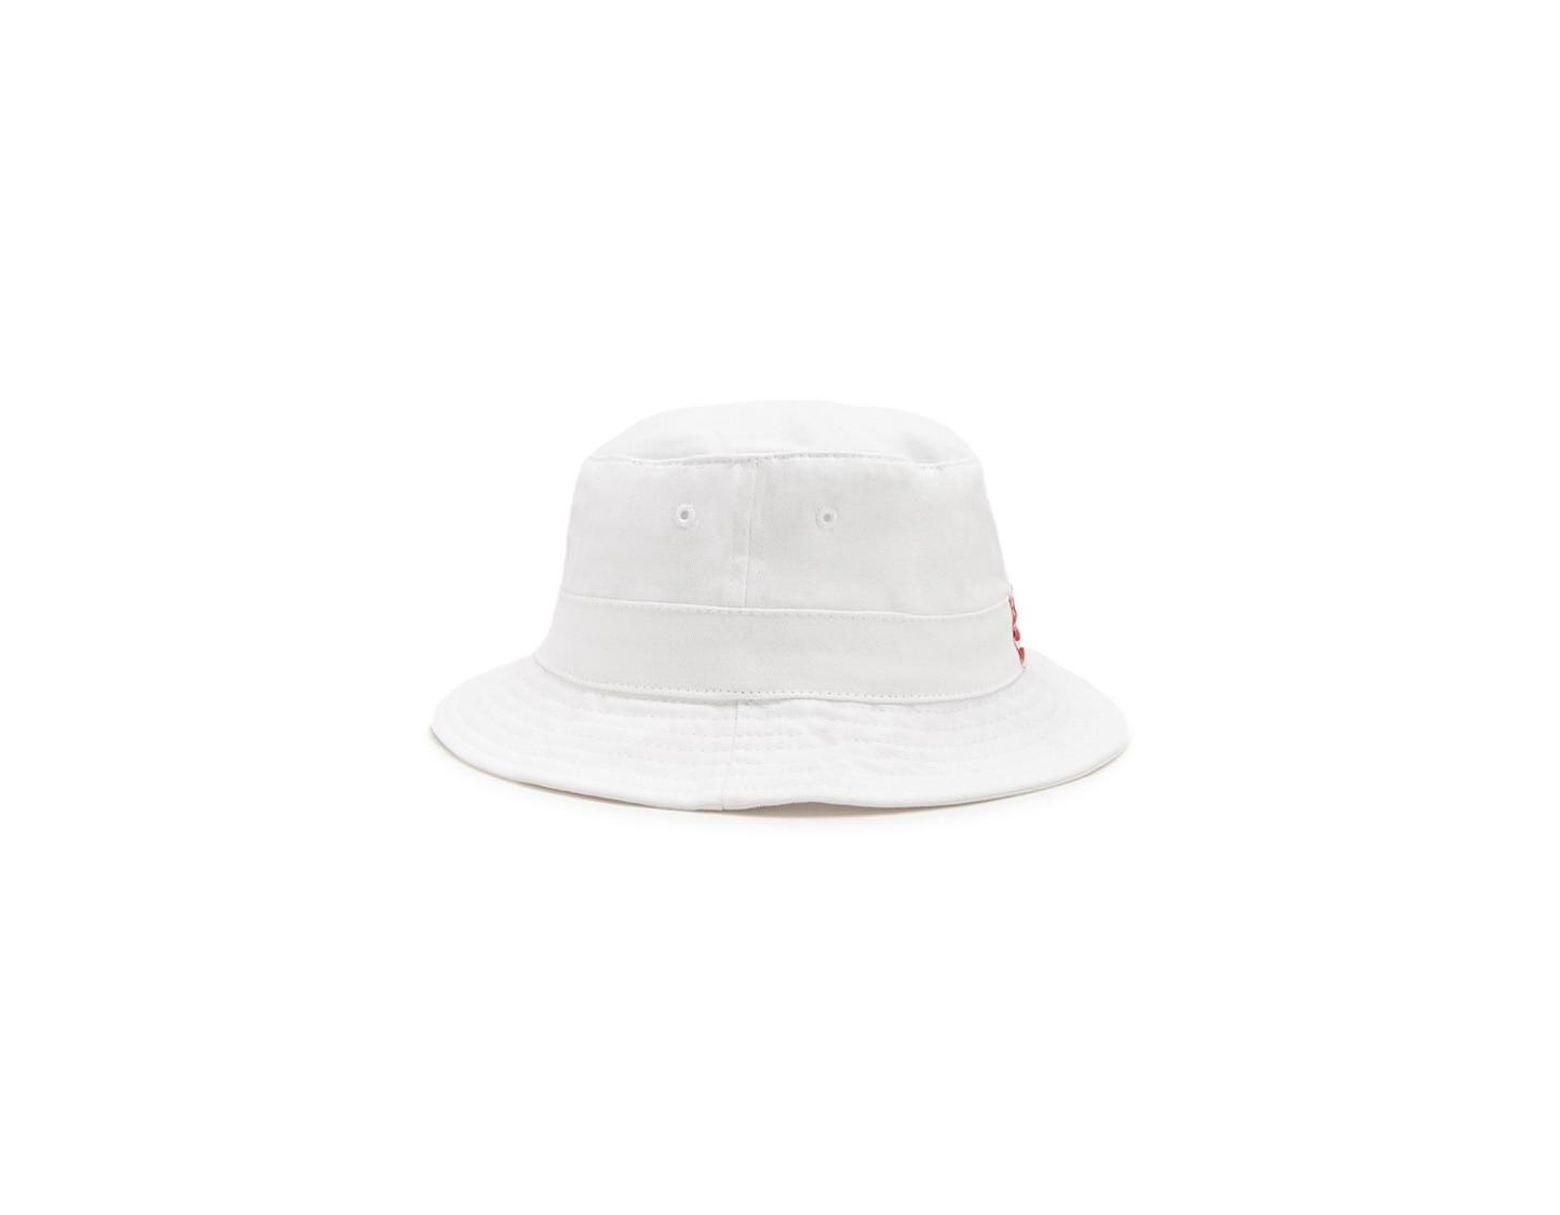 d5e75410 Forever 21 Coca-cola Bucket Hat , White/multi in White - Lyst